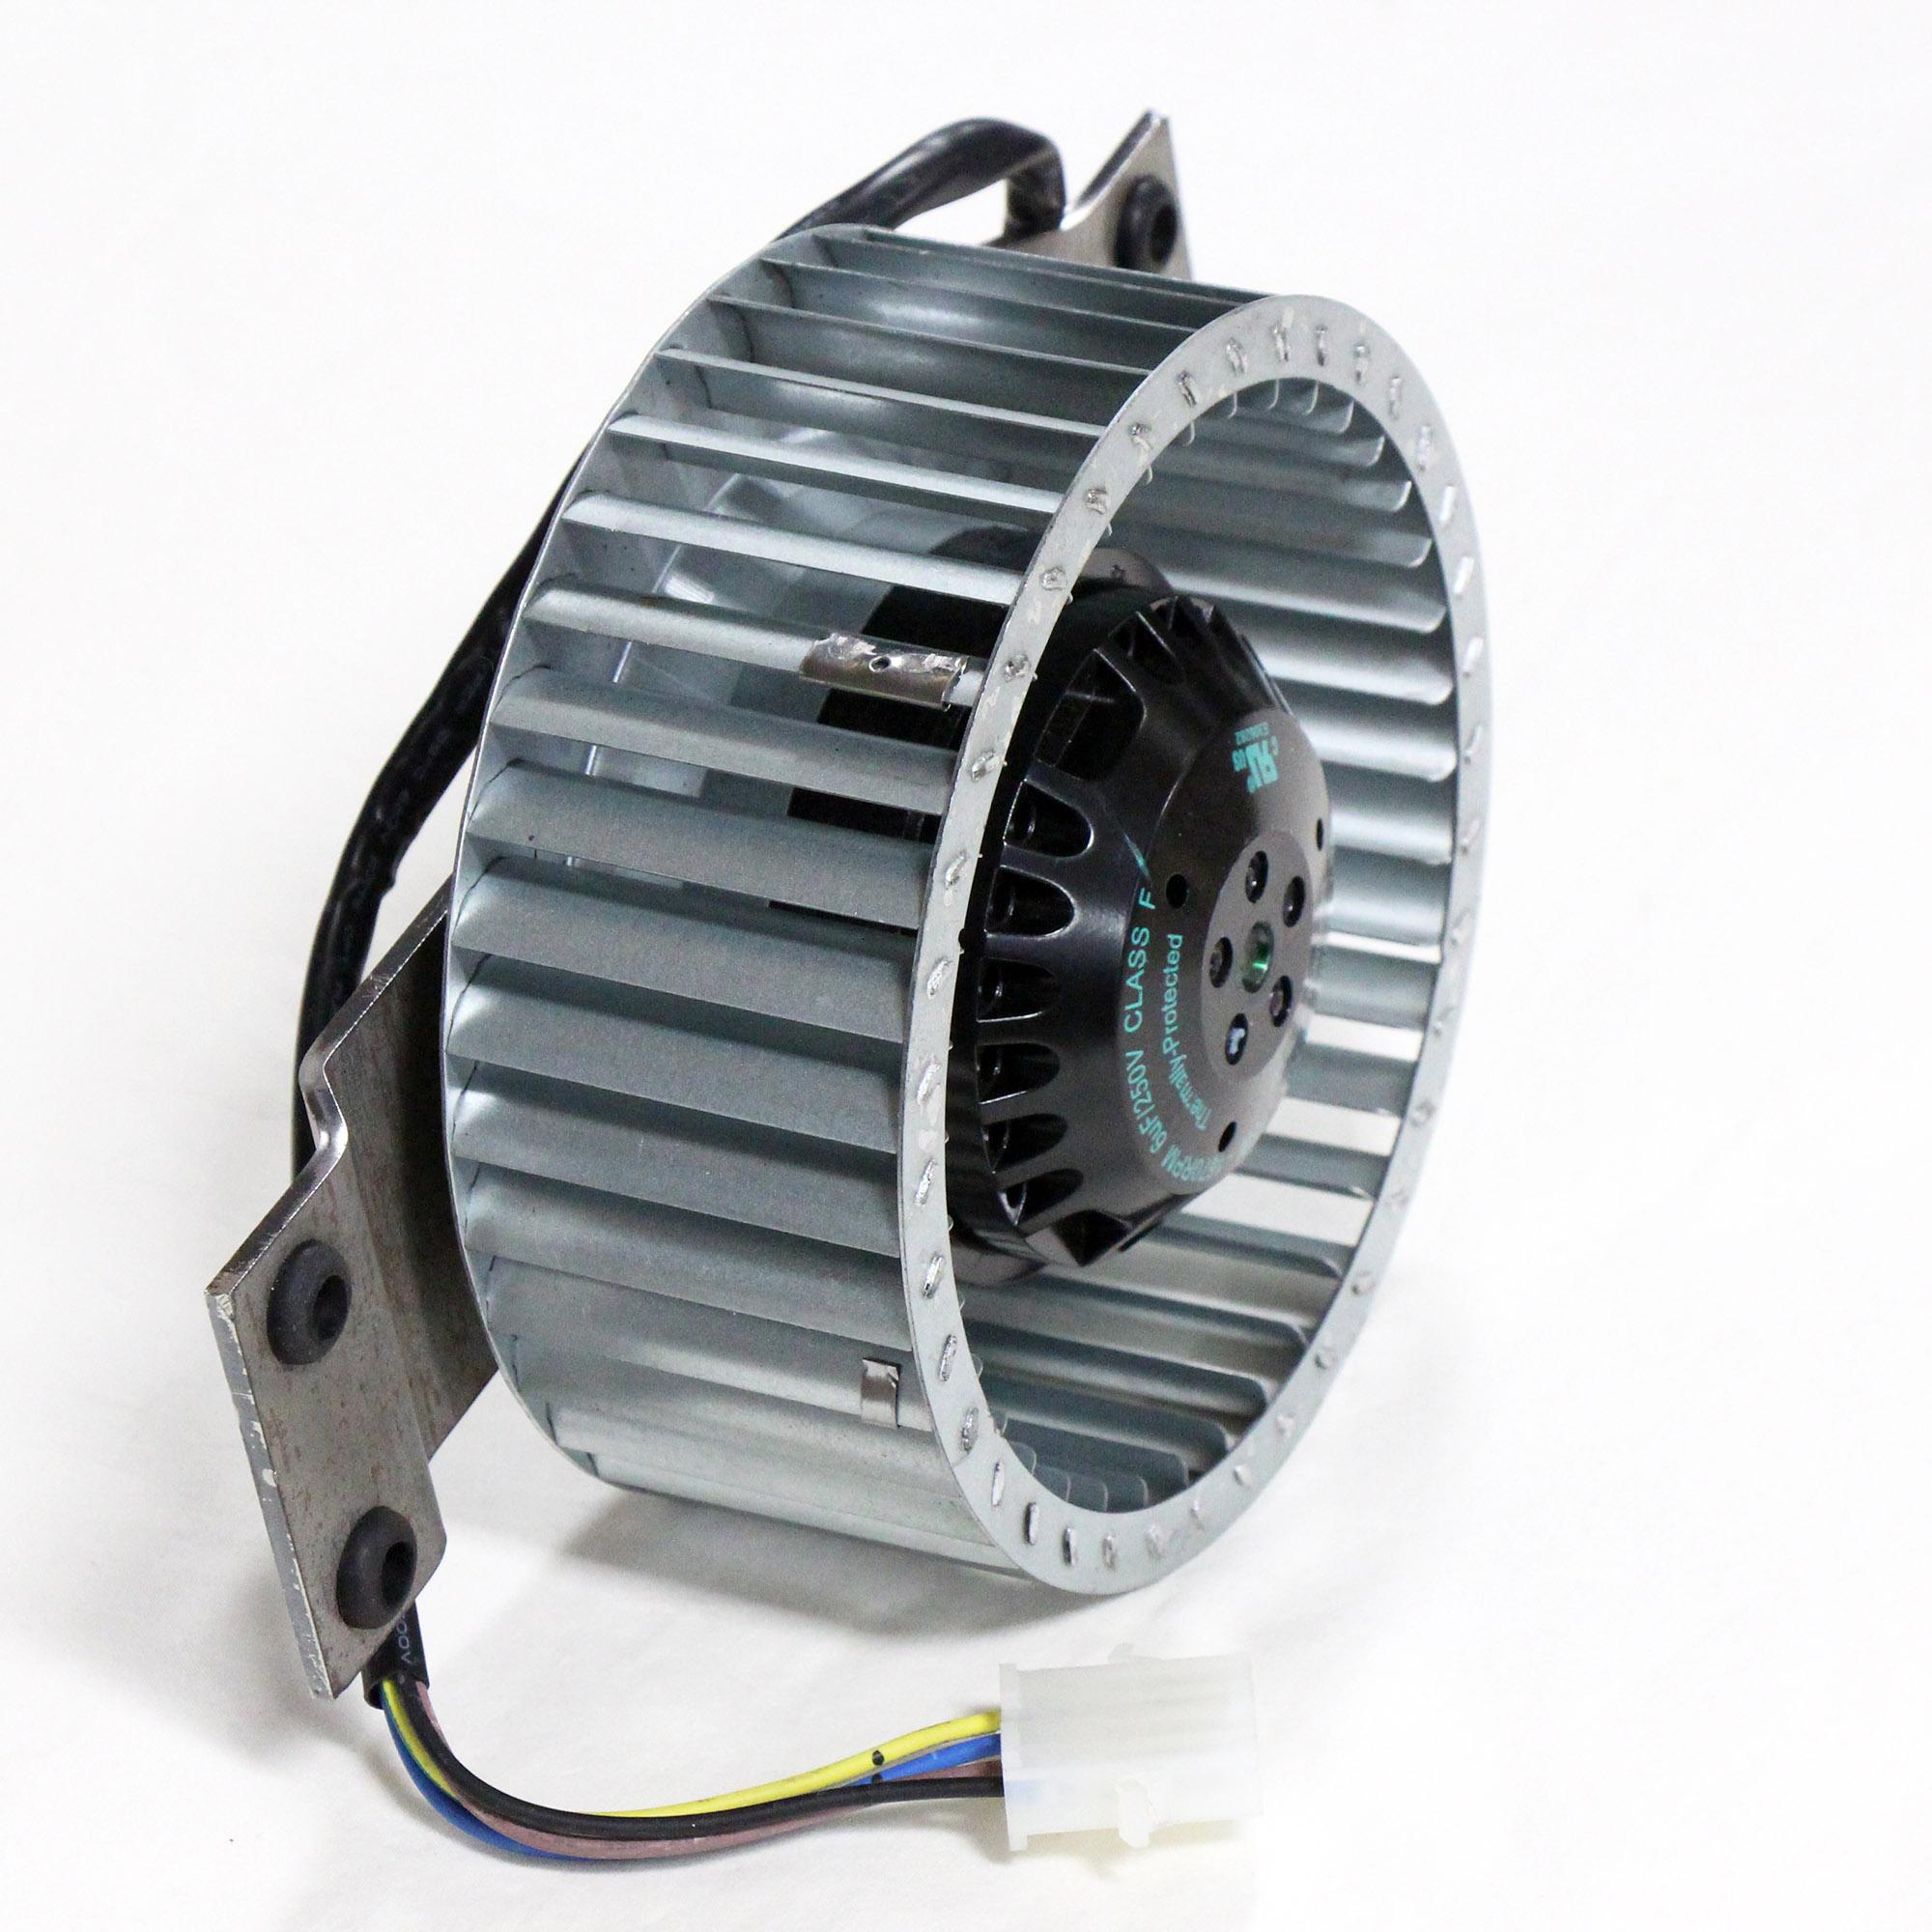 Reversomatic bathroom ventilation exhaust fan motorbladebrackettl240mbb